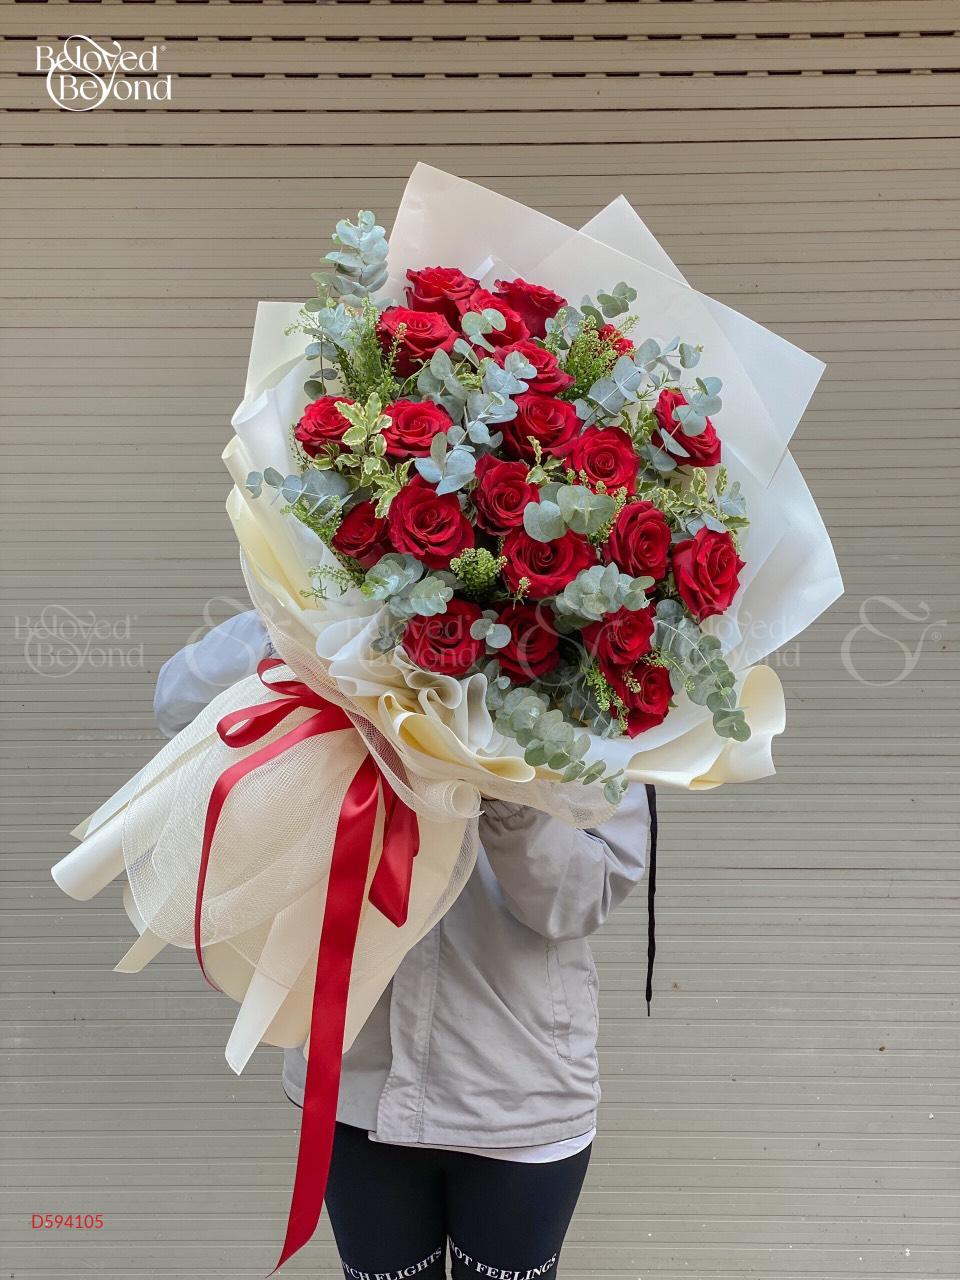 Ngọt ngào - D594105 - xinhtuoi.online